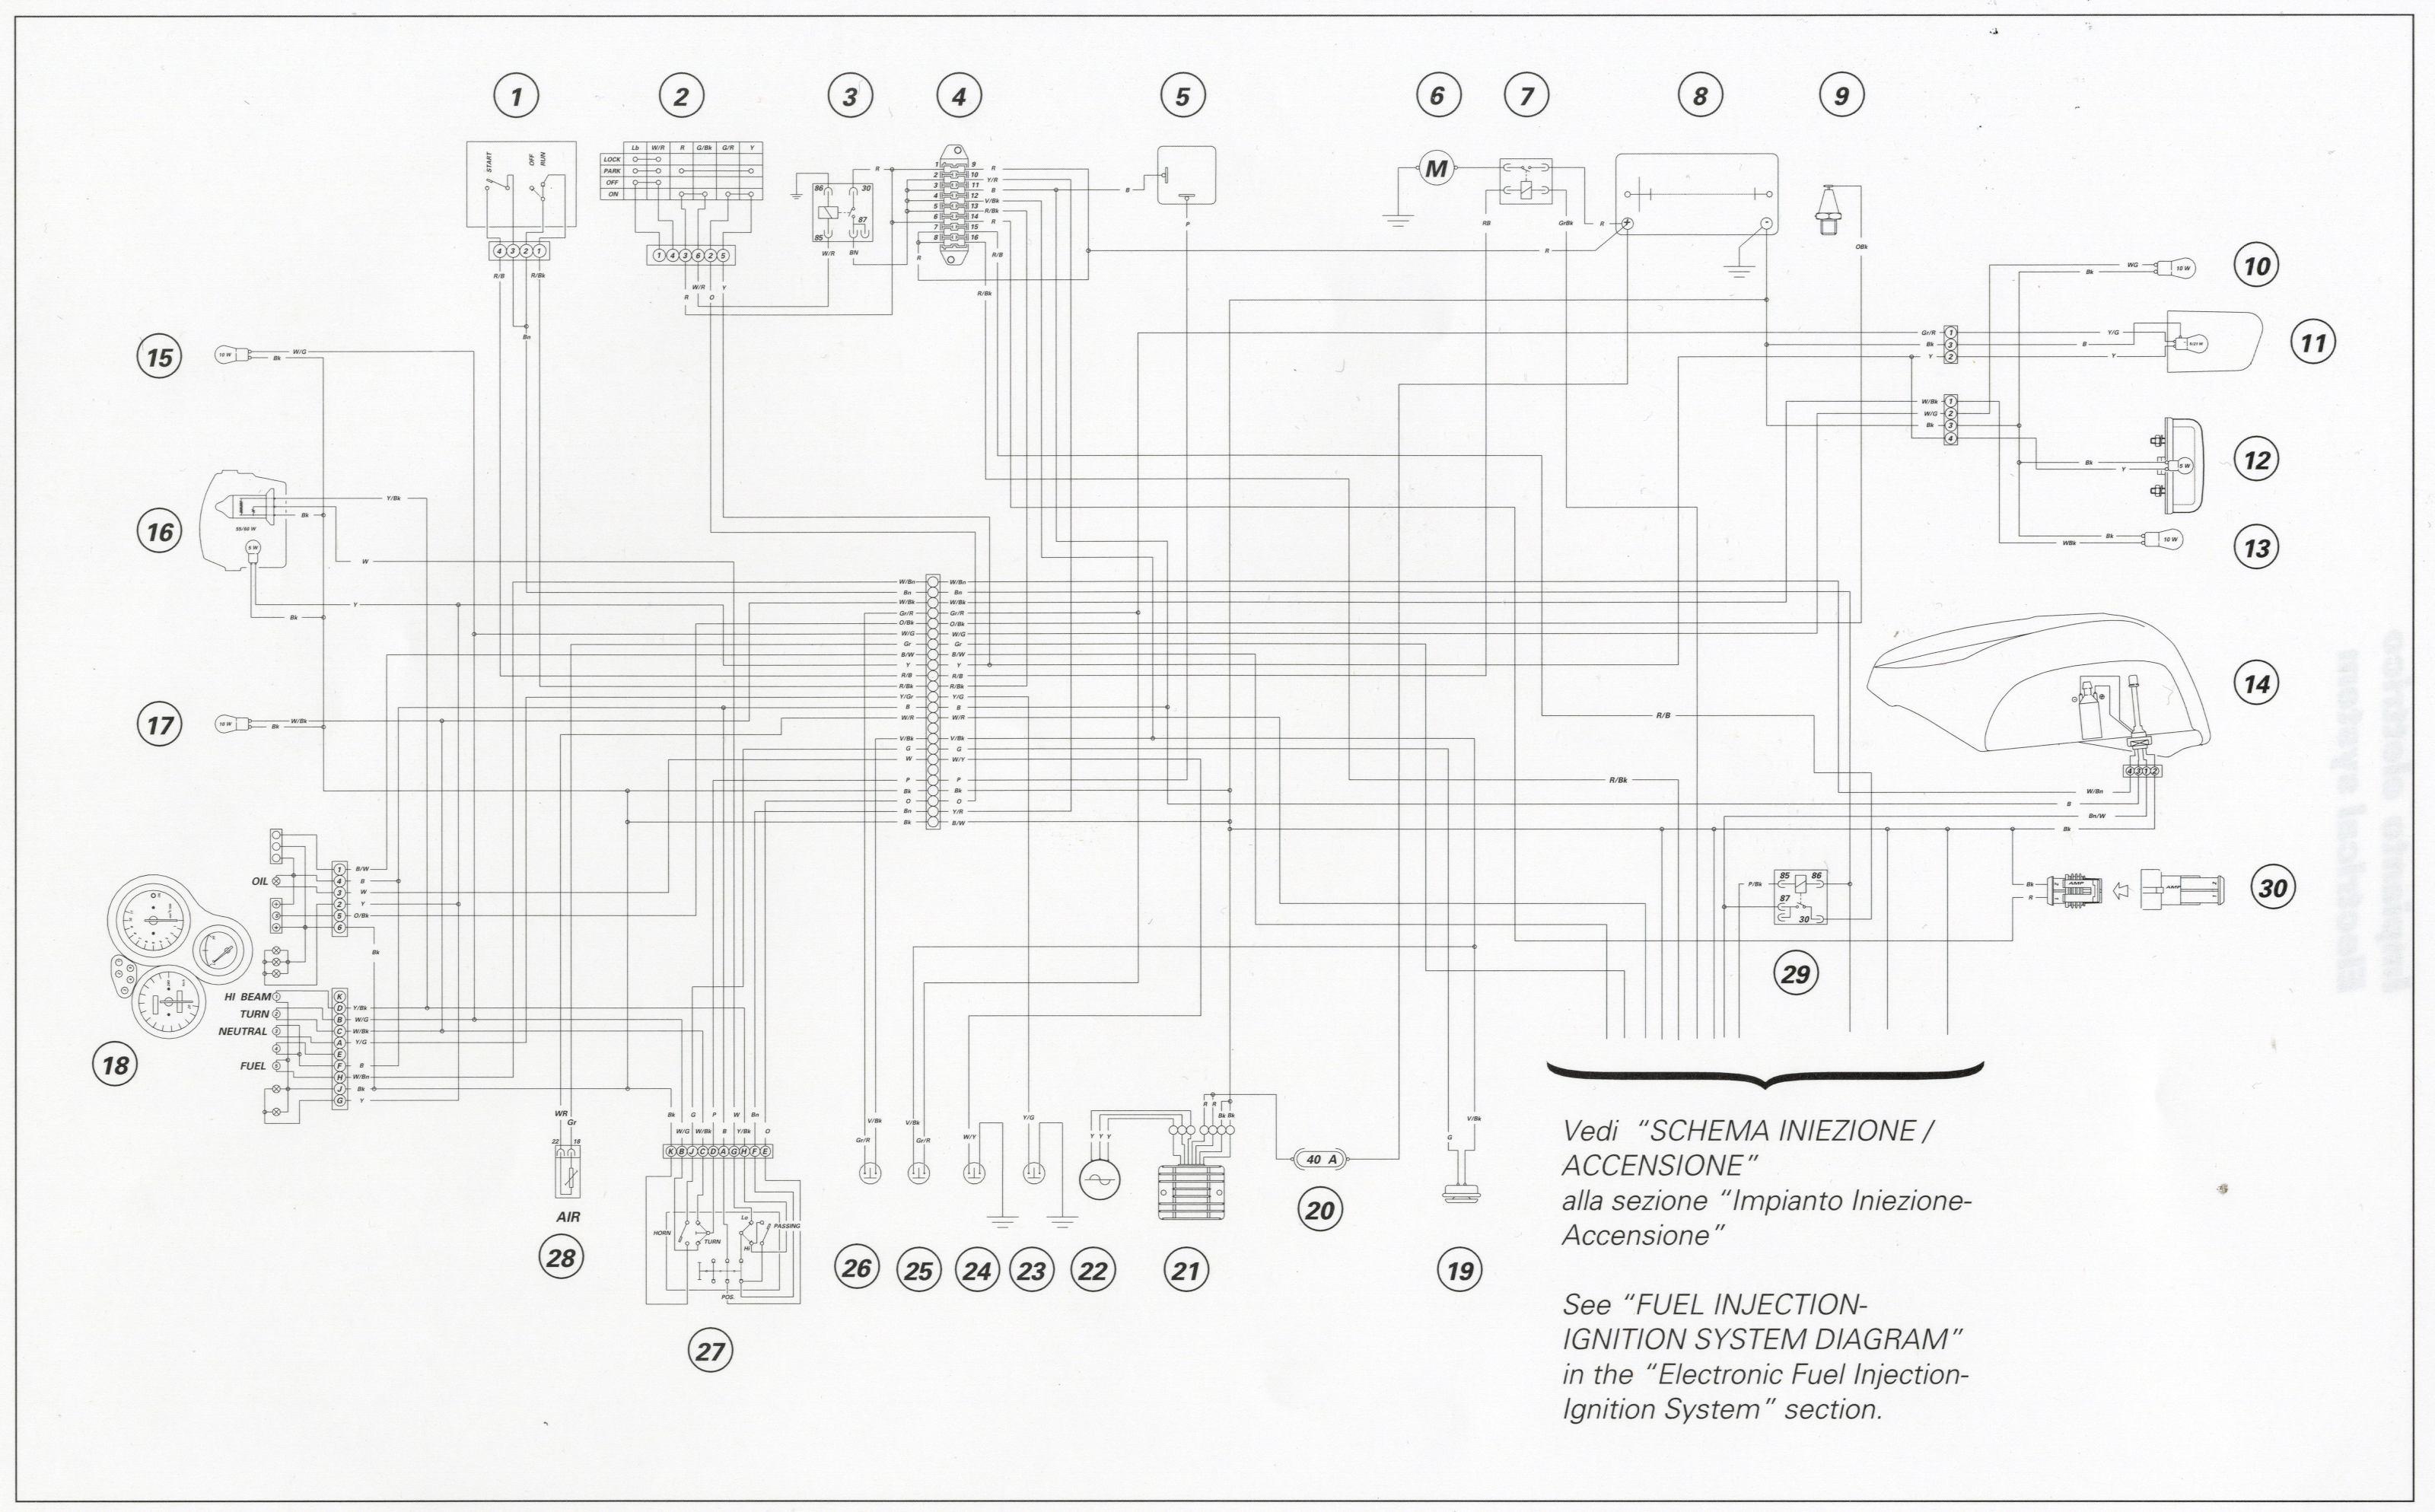 ducati 916 wiring diagram free wiring diagram2002 ducati 900 wiring diagram wiring diagramducati 916 wiring diagram free ducati ignition module wiringducati 900ss